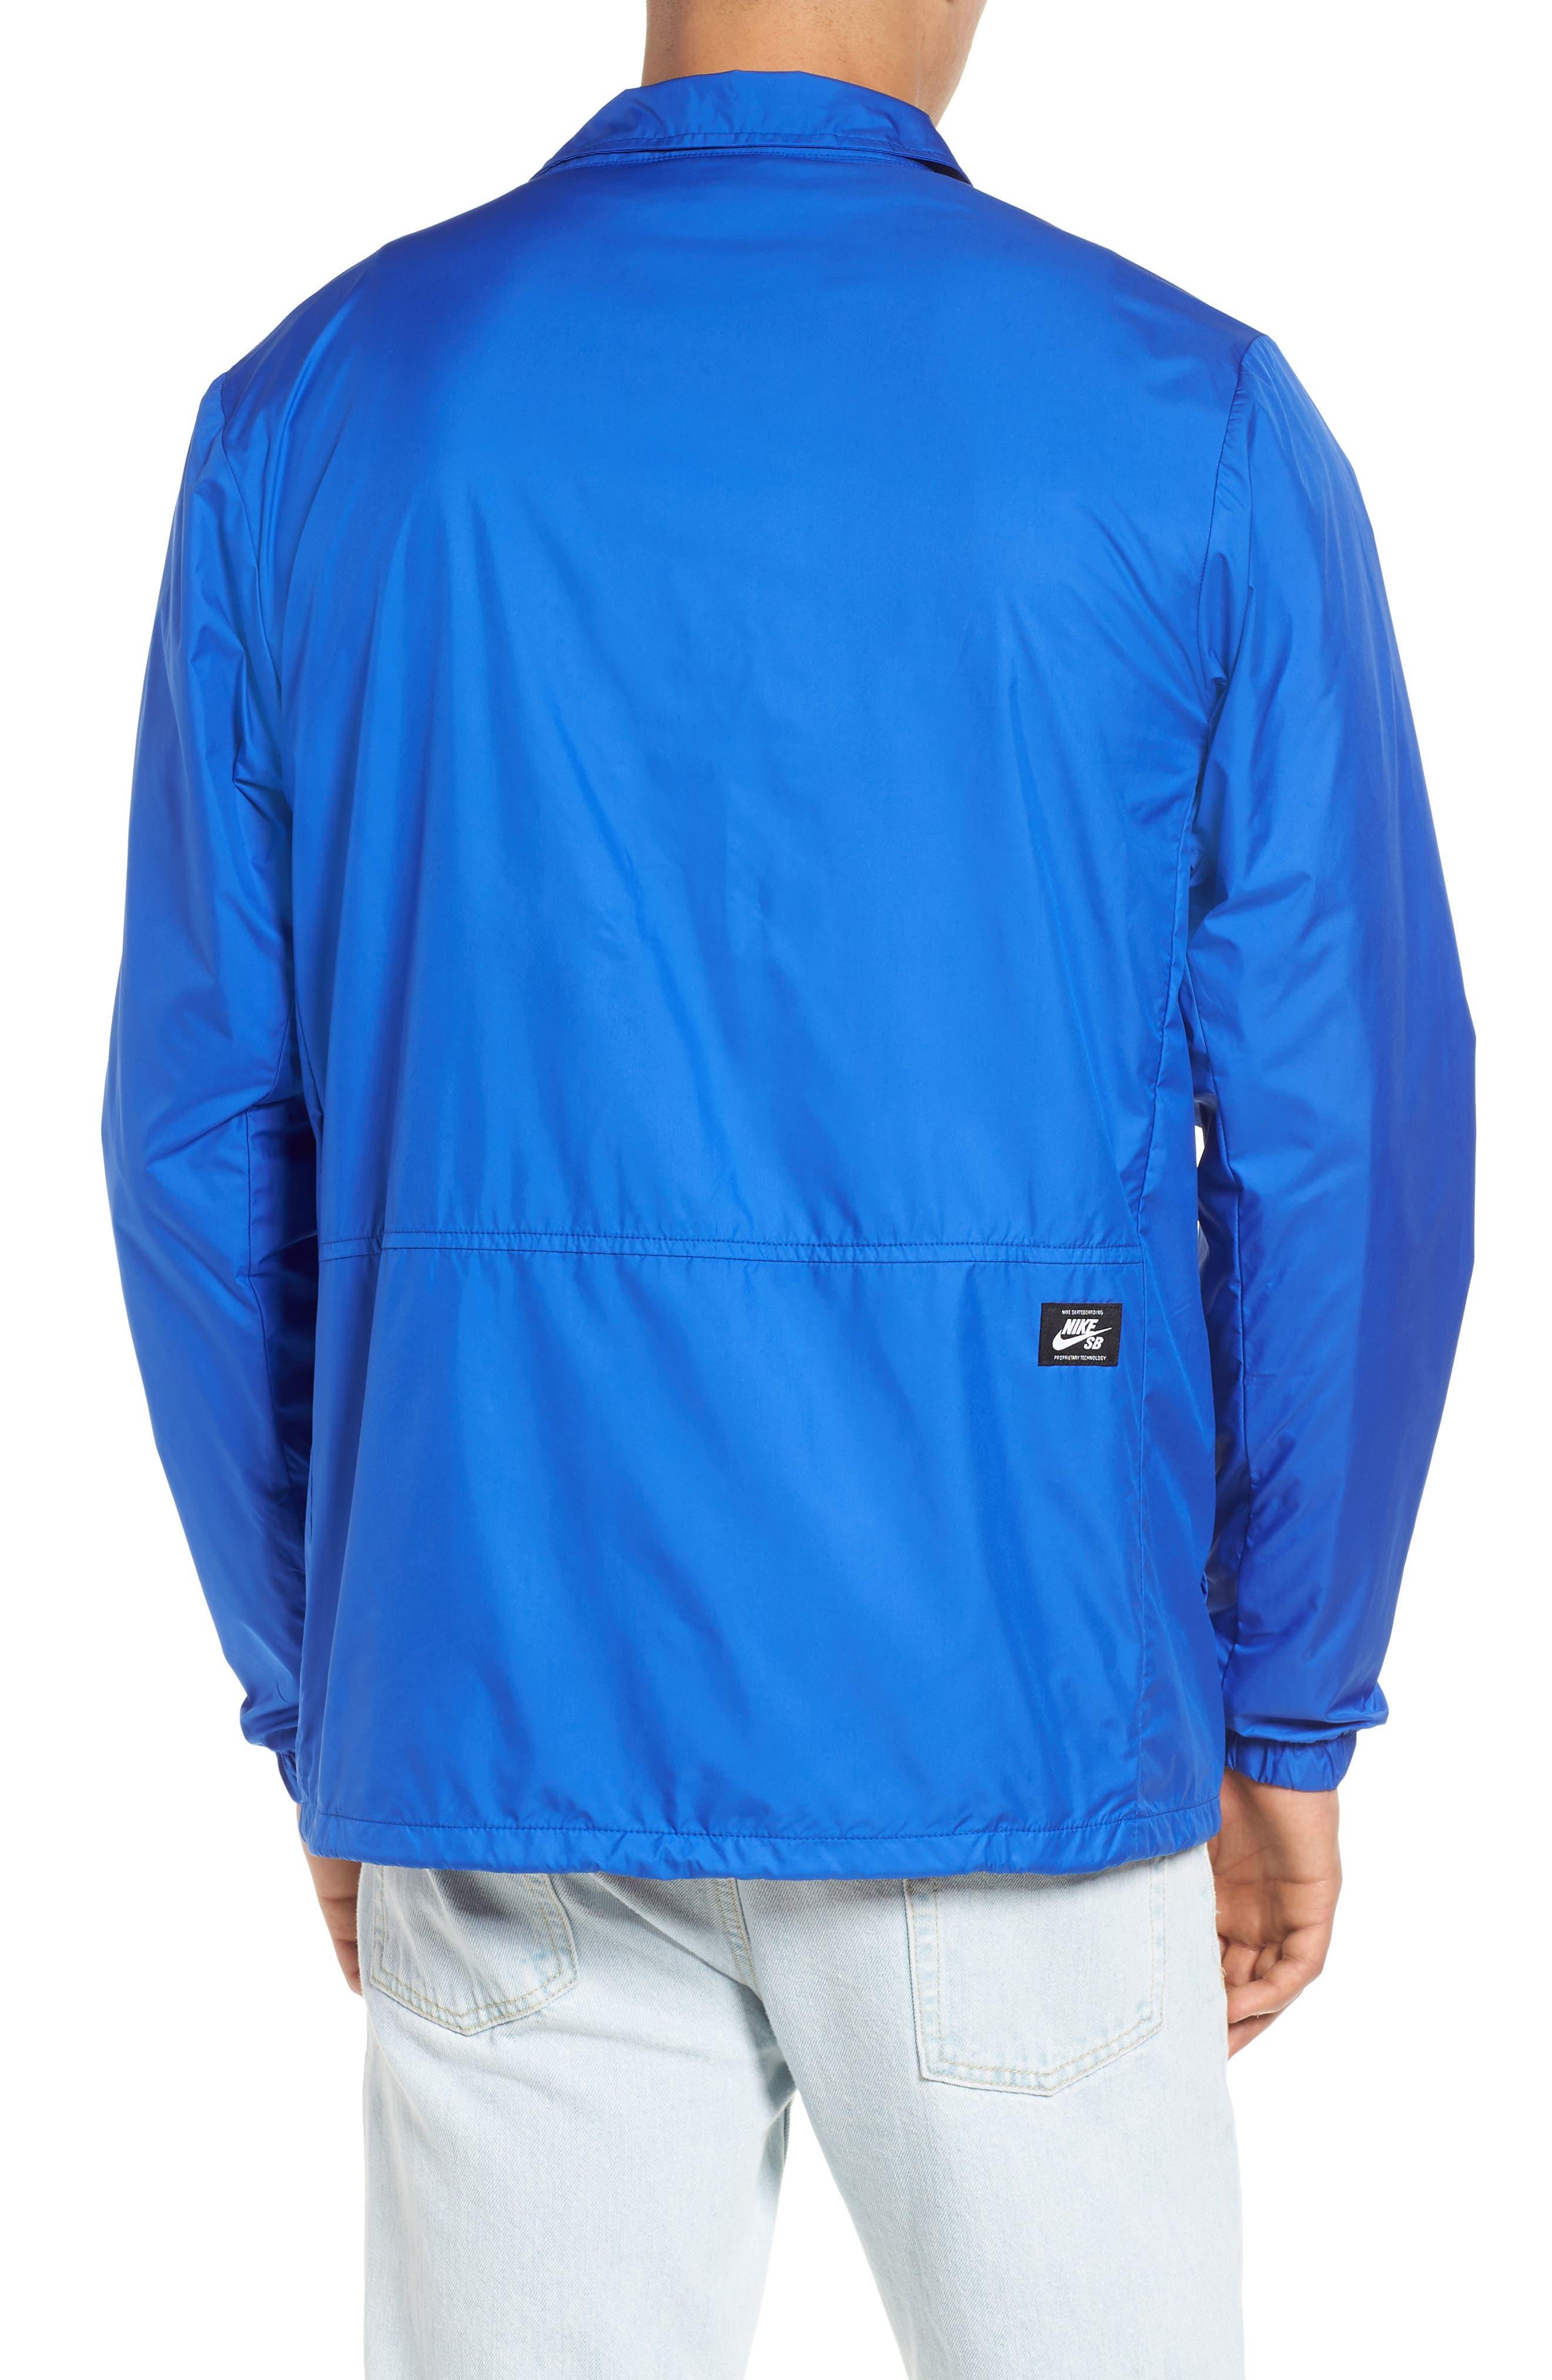 SB Shield Coach's Jacket,                             Alternate thumbnail 2, color,                             HYPER ROYAL/ WHITE